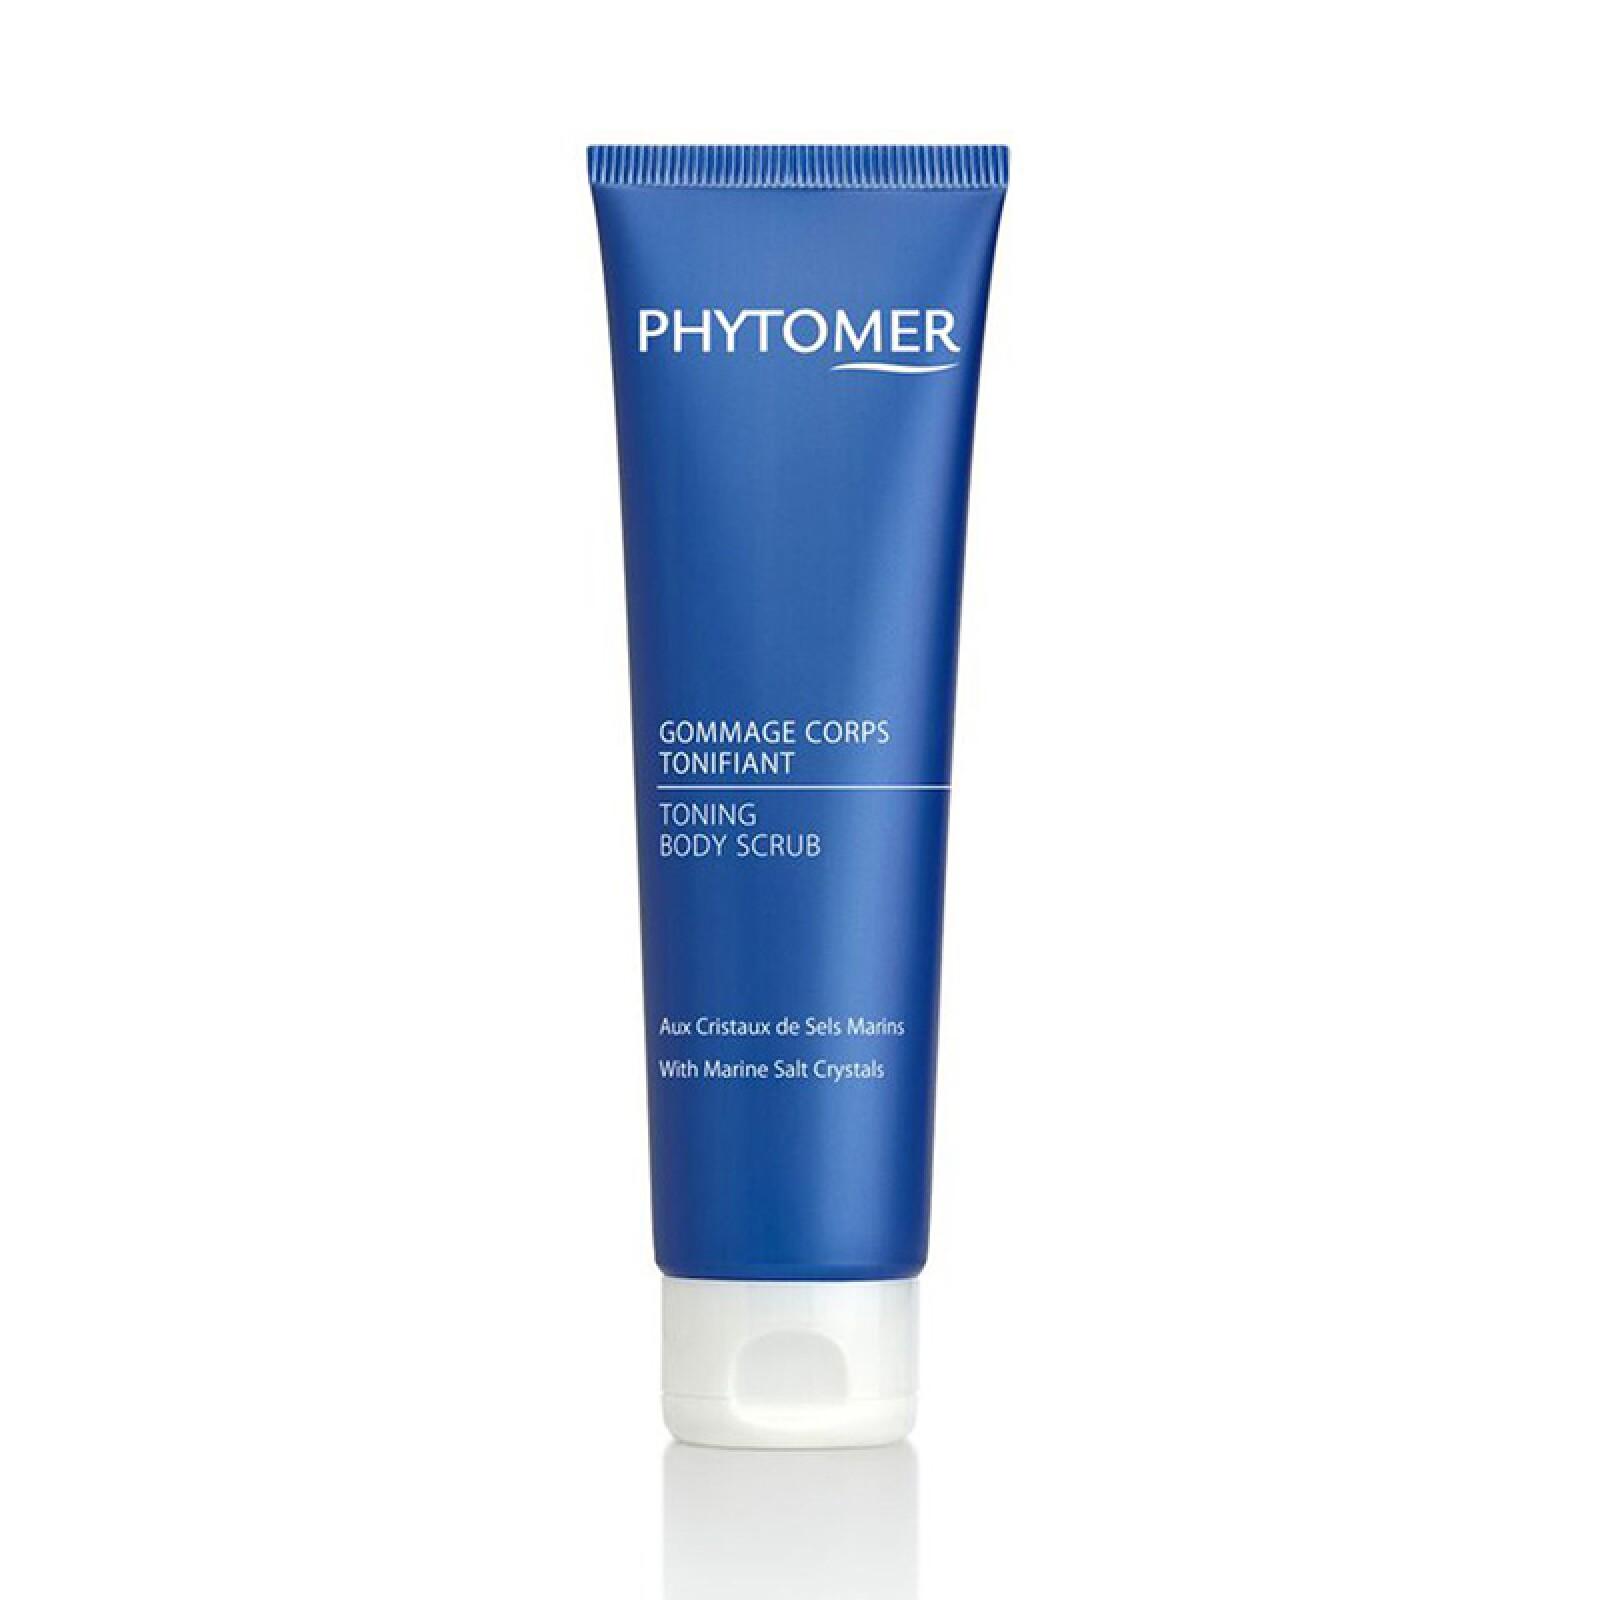 Phytomer-Toning-Body-Scrub.jpg